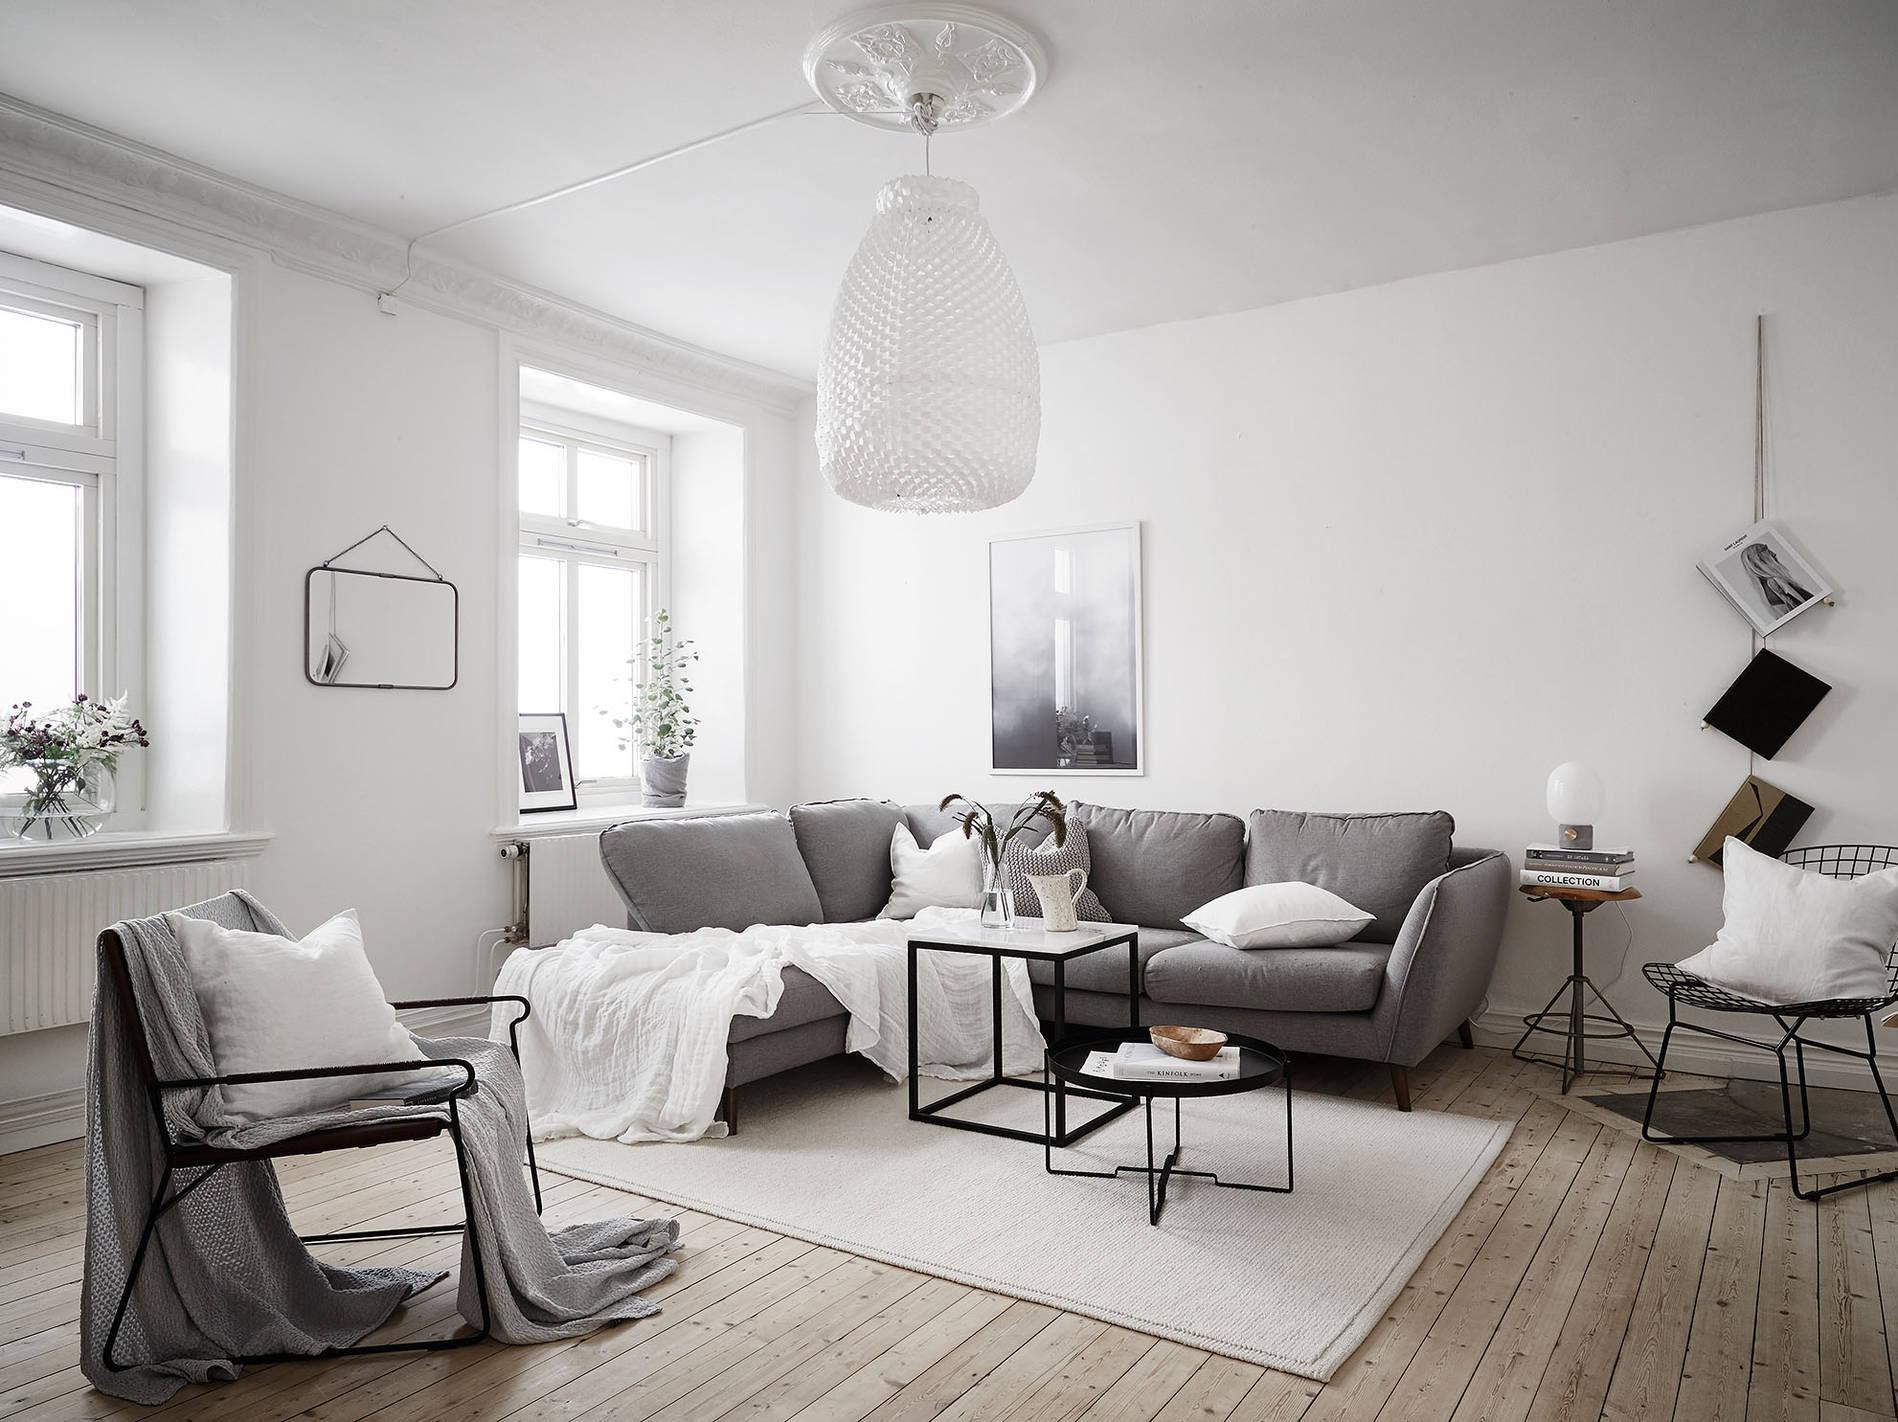 mesmerizing scandinavian living room on with later | DIY Ideas for Scandinavian Styled Living Rooms